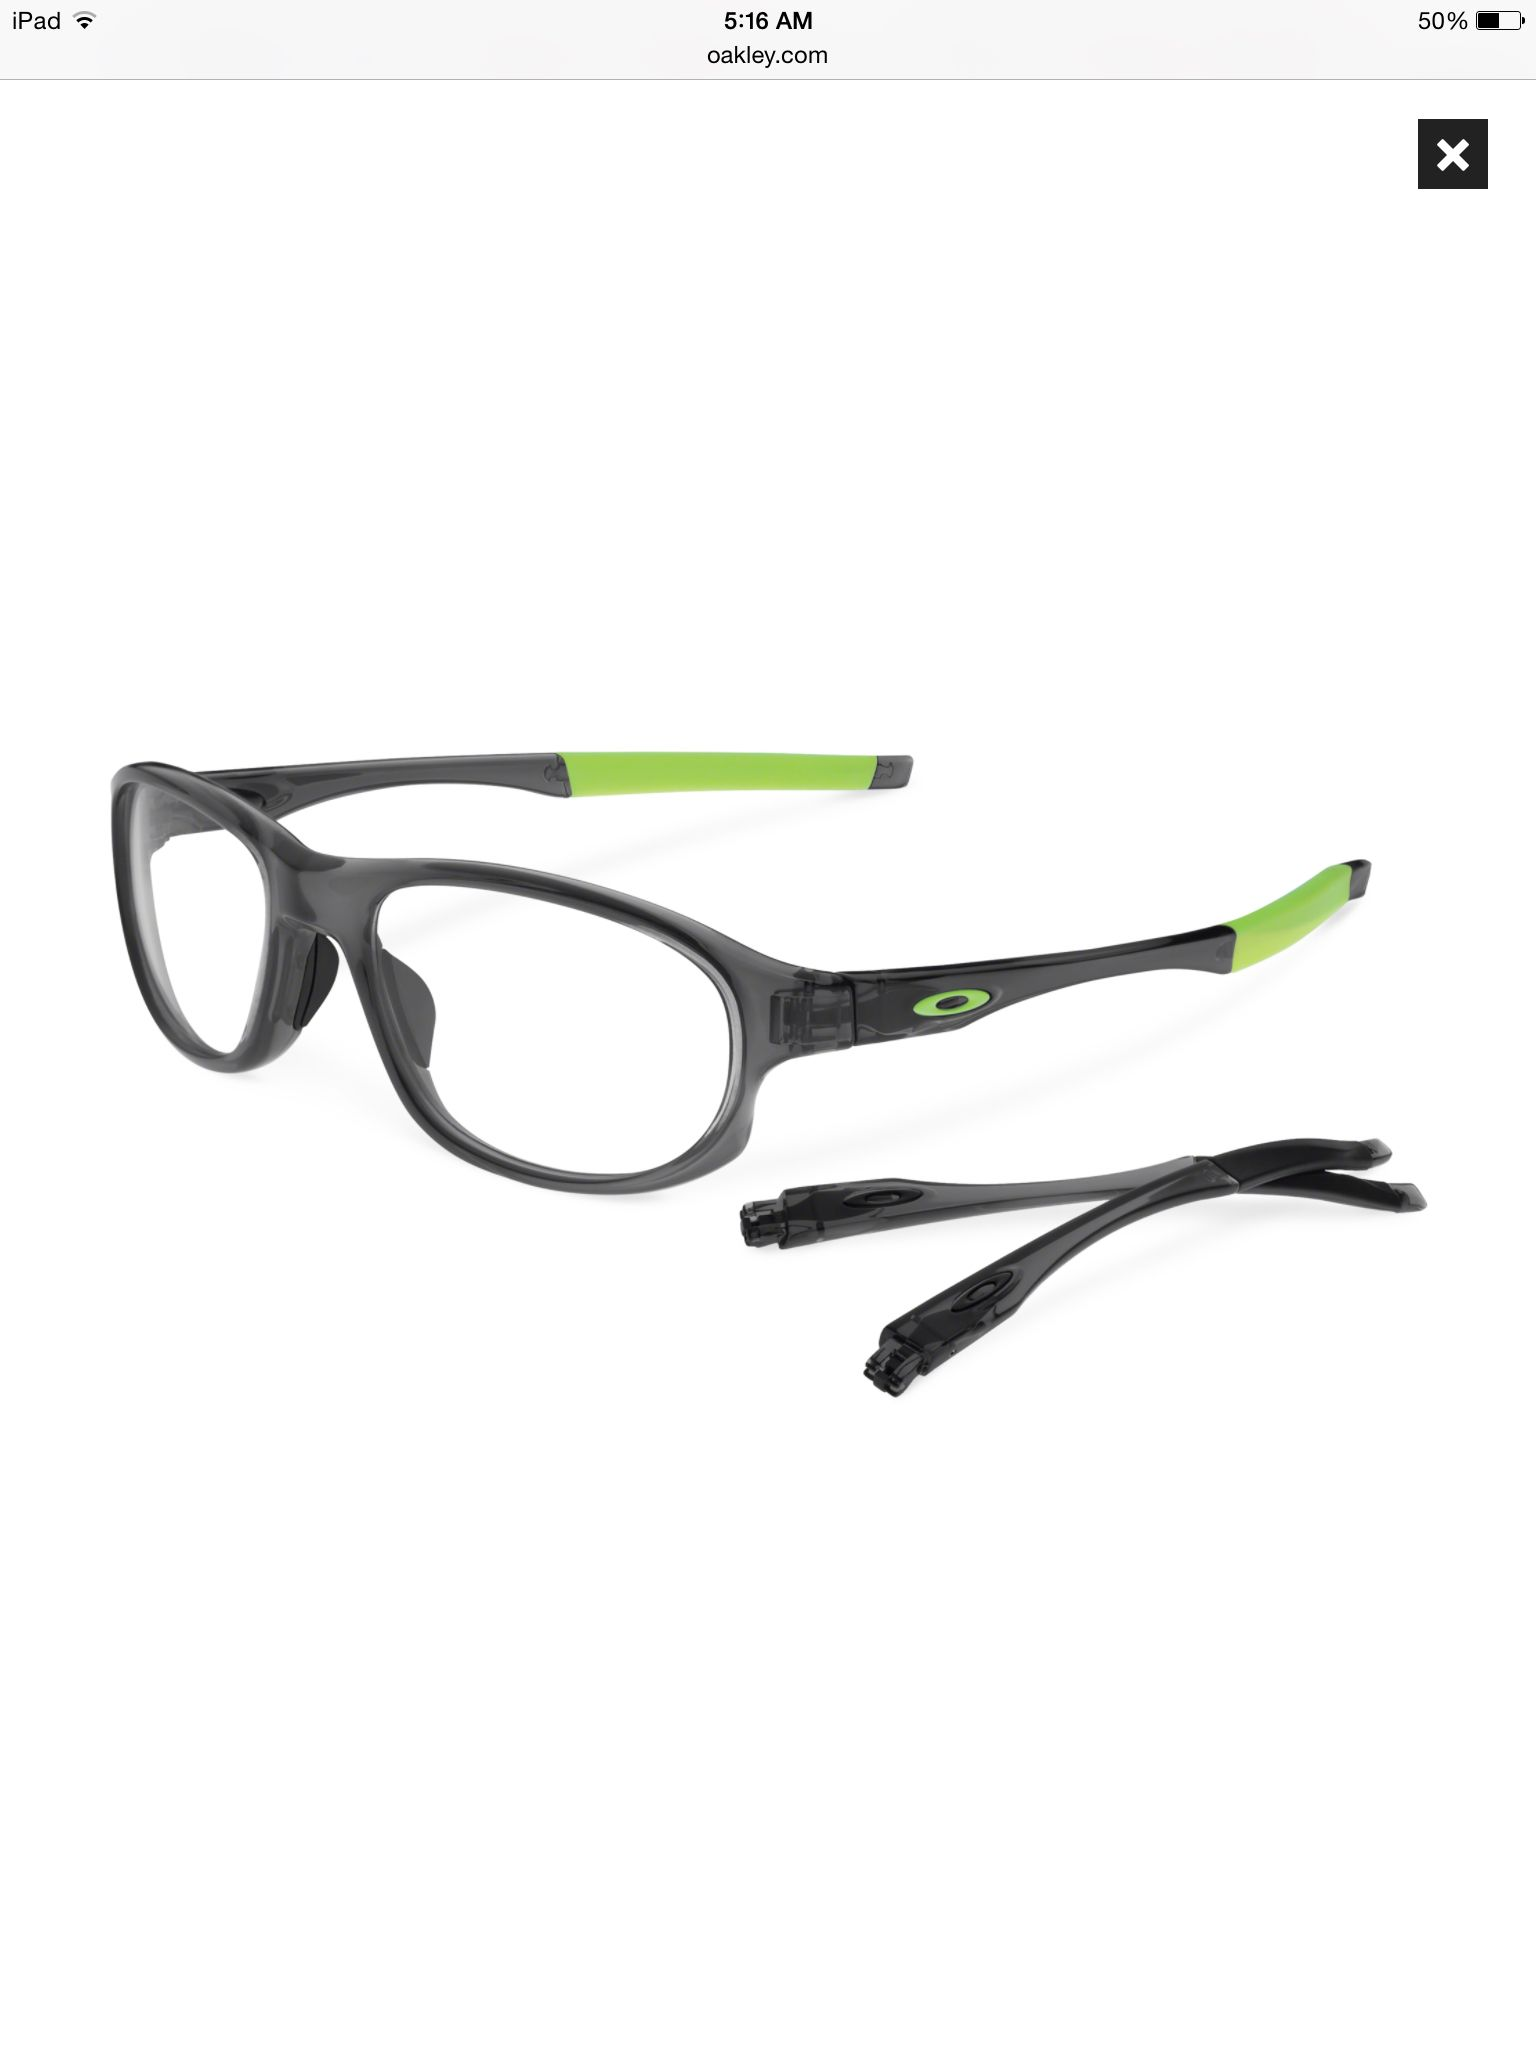 9a992395653 ... usa oakley crosslink strike b3e8a 5e3ee cheap oakley sunglasses jawbone  ...